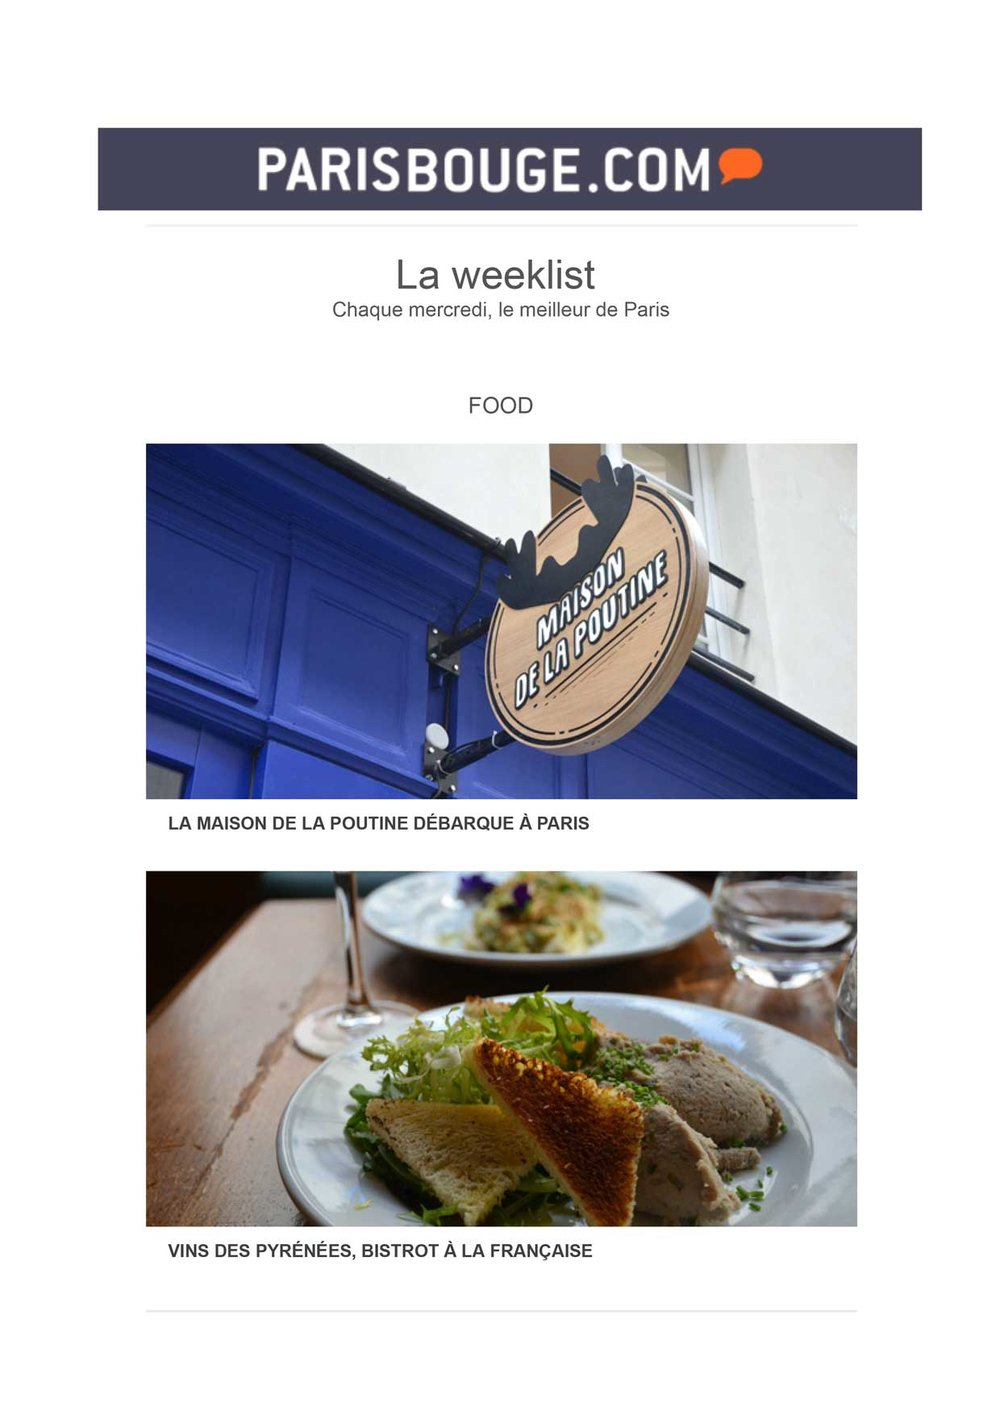 06-12-2017-Newsletter-Paris-Bouge.jpg